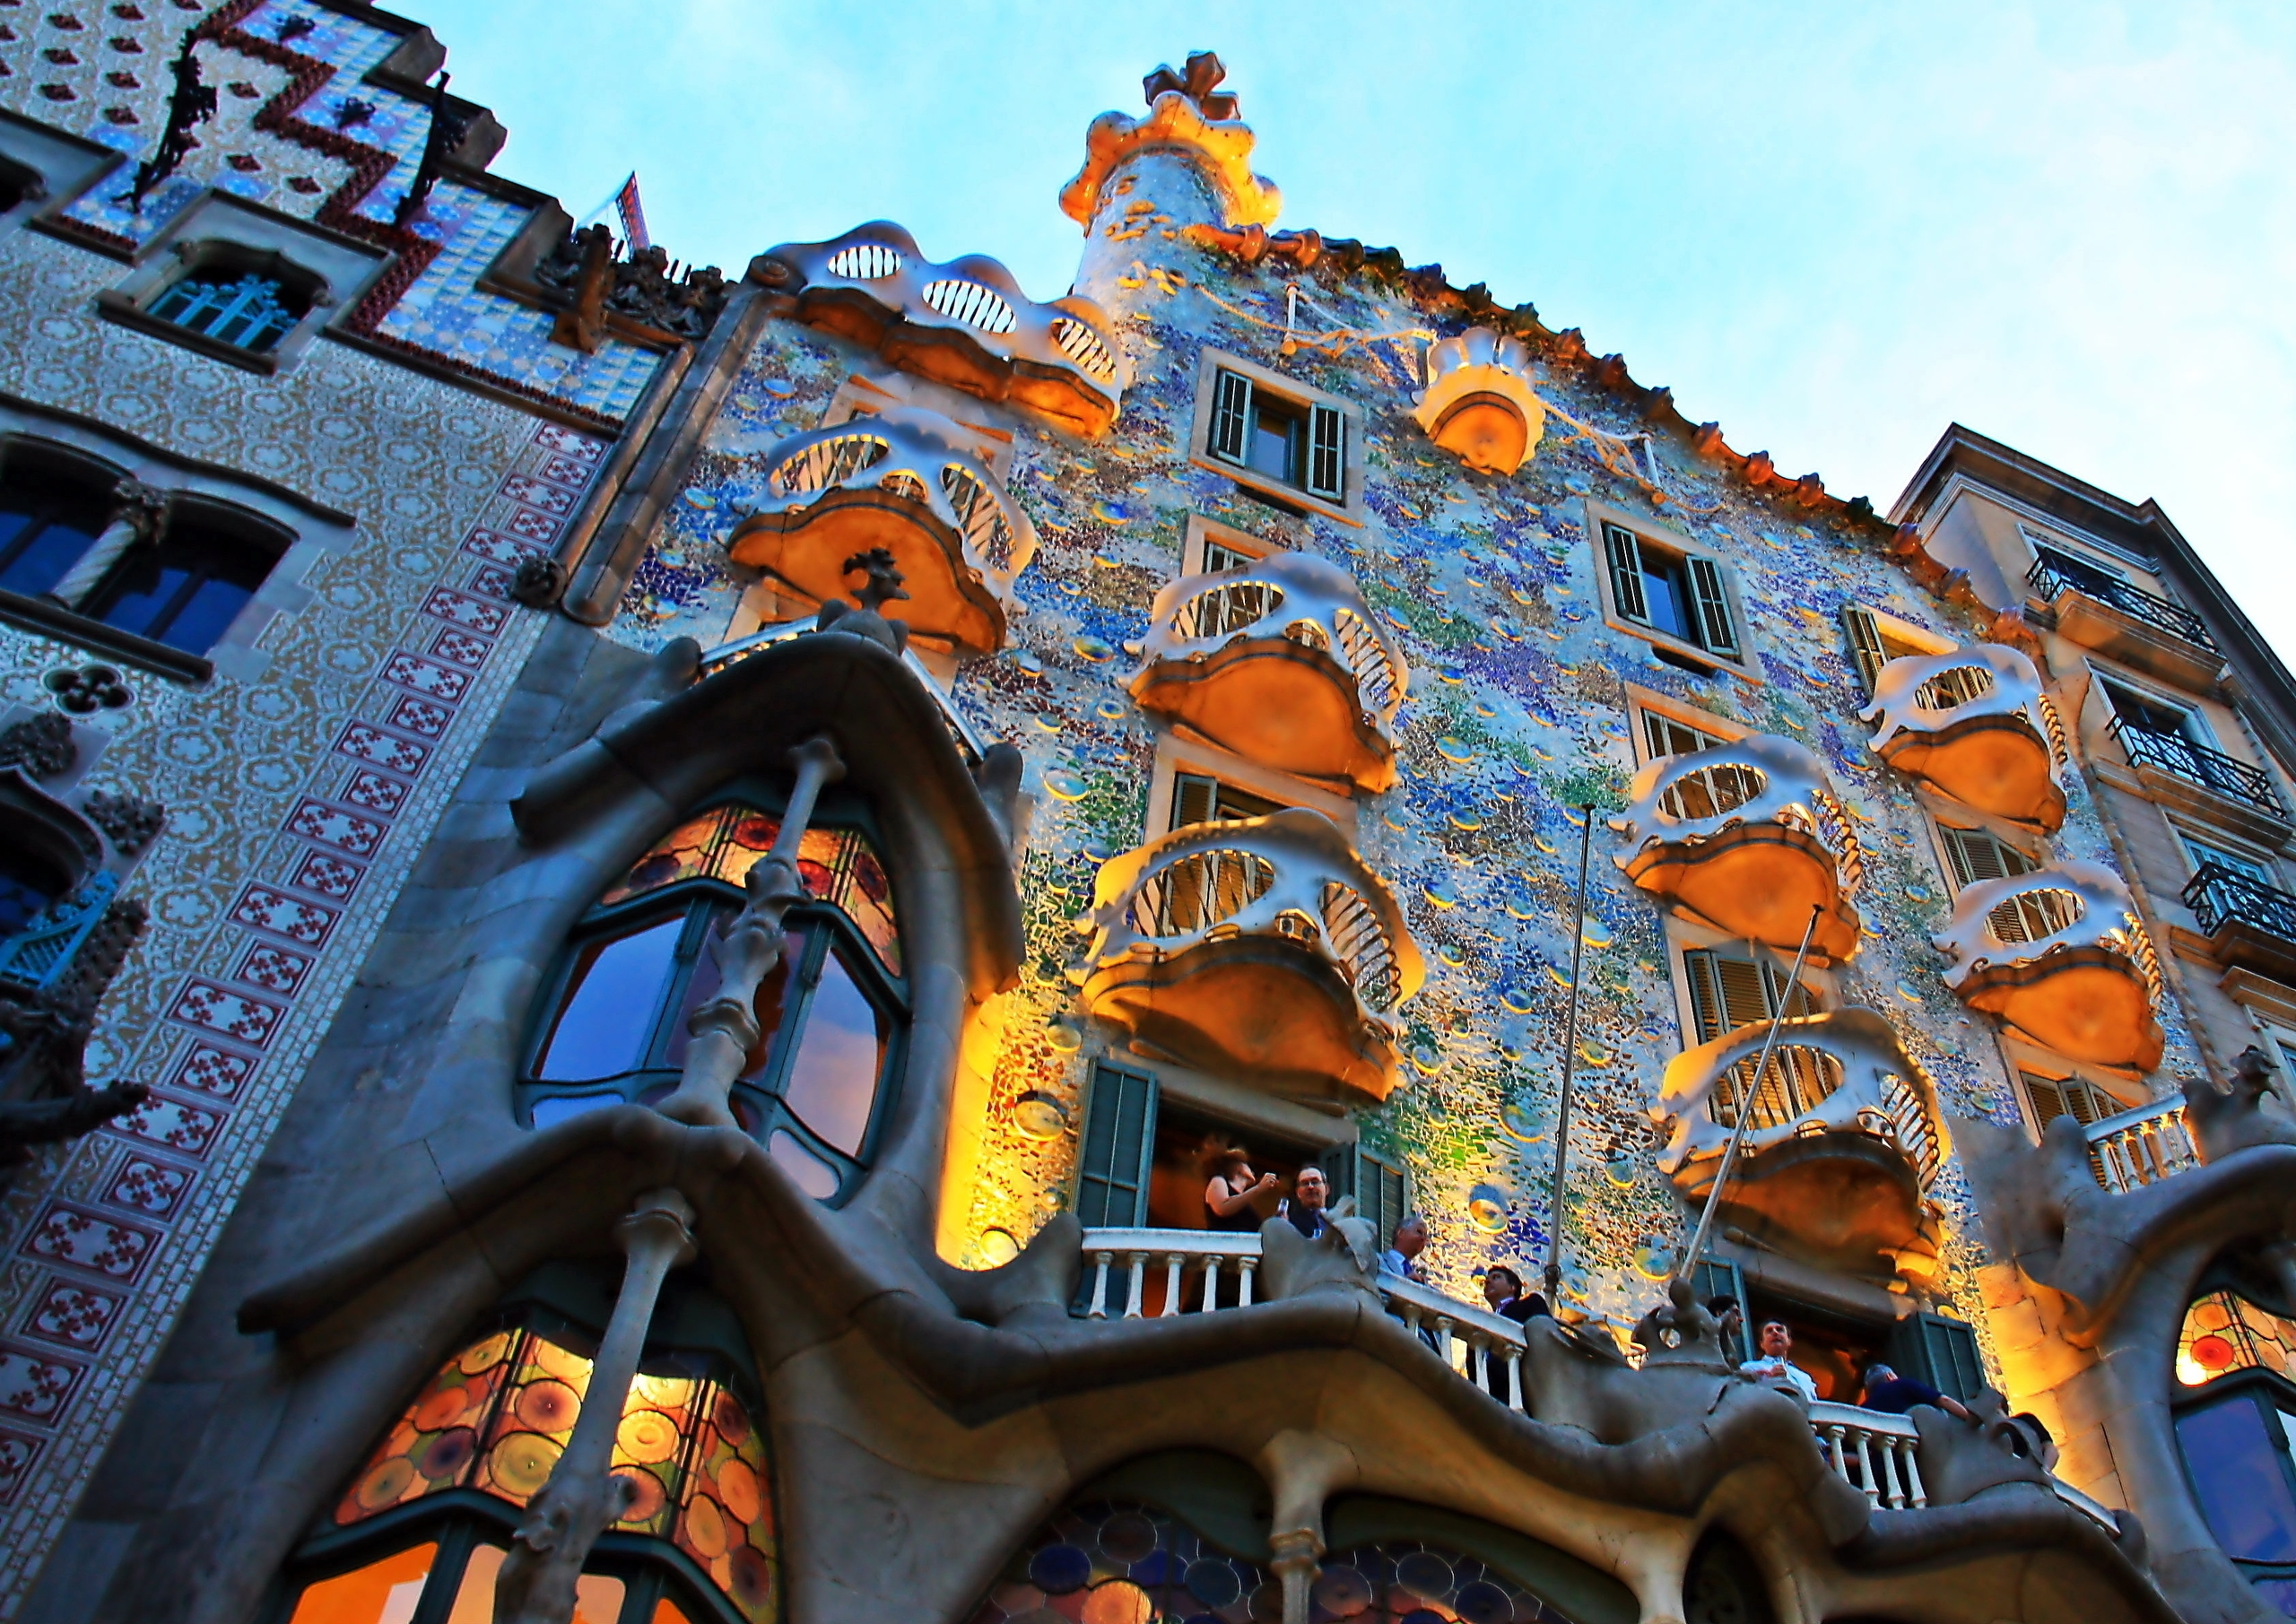 Gaudis_Barcelona_(8202432438).jpg